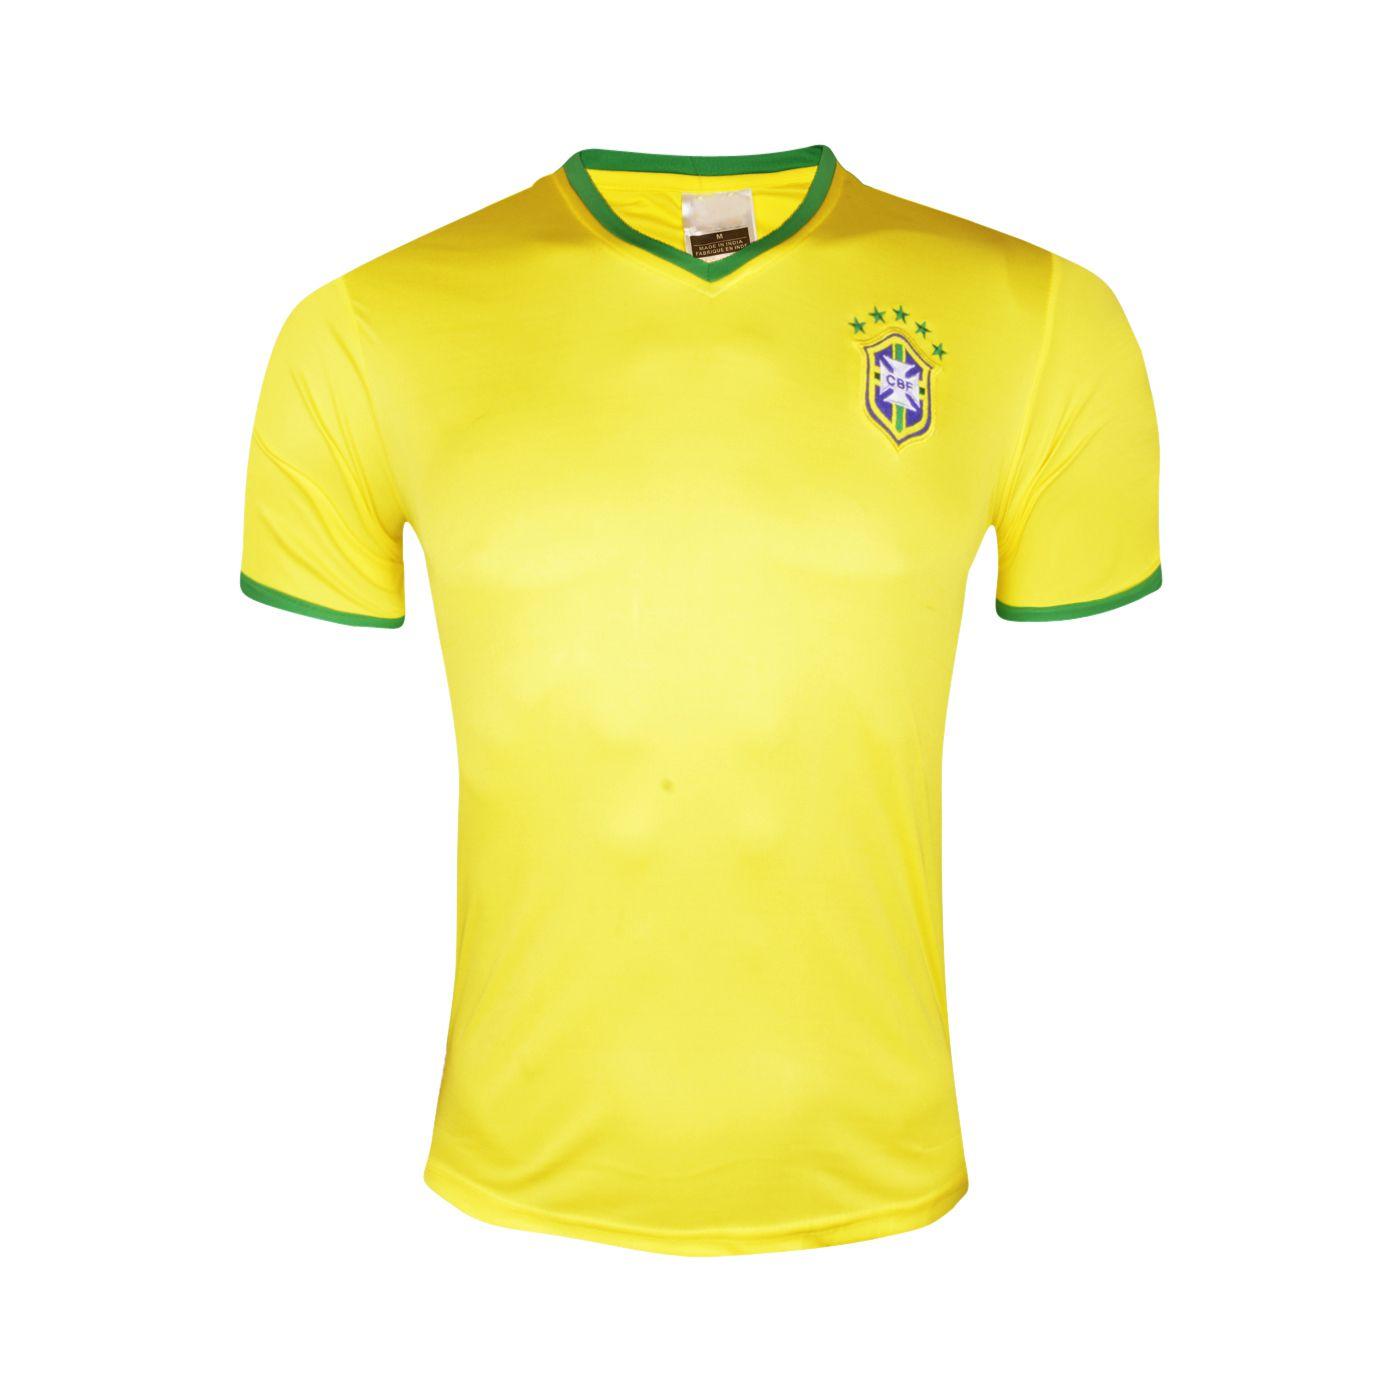 watch b925e cca6d FIFA World Cup Brazil National Football Team Yellow Color Jersey LCL